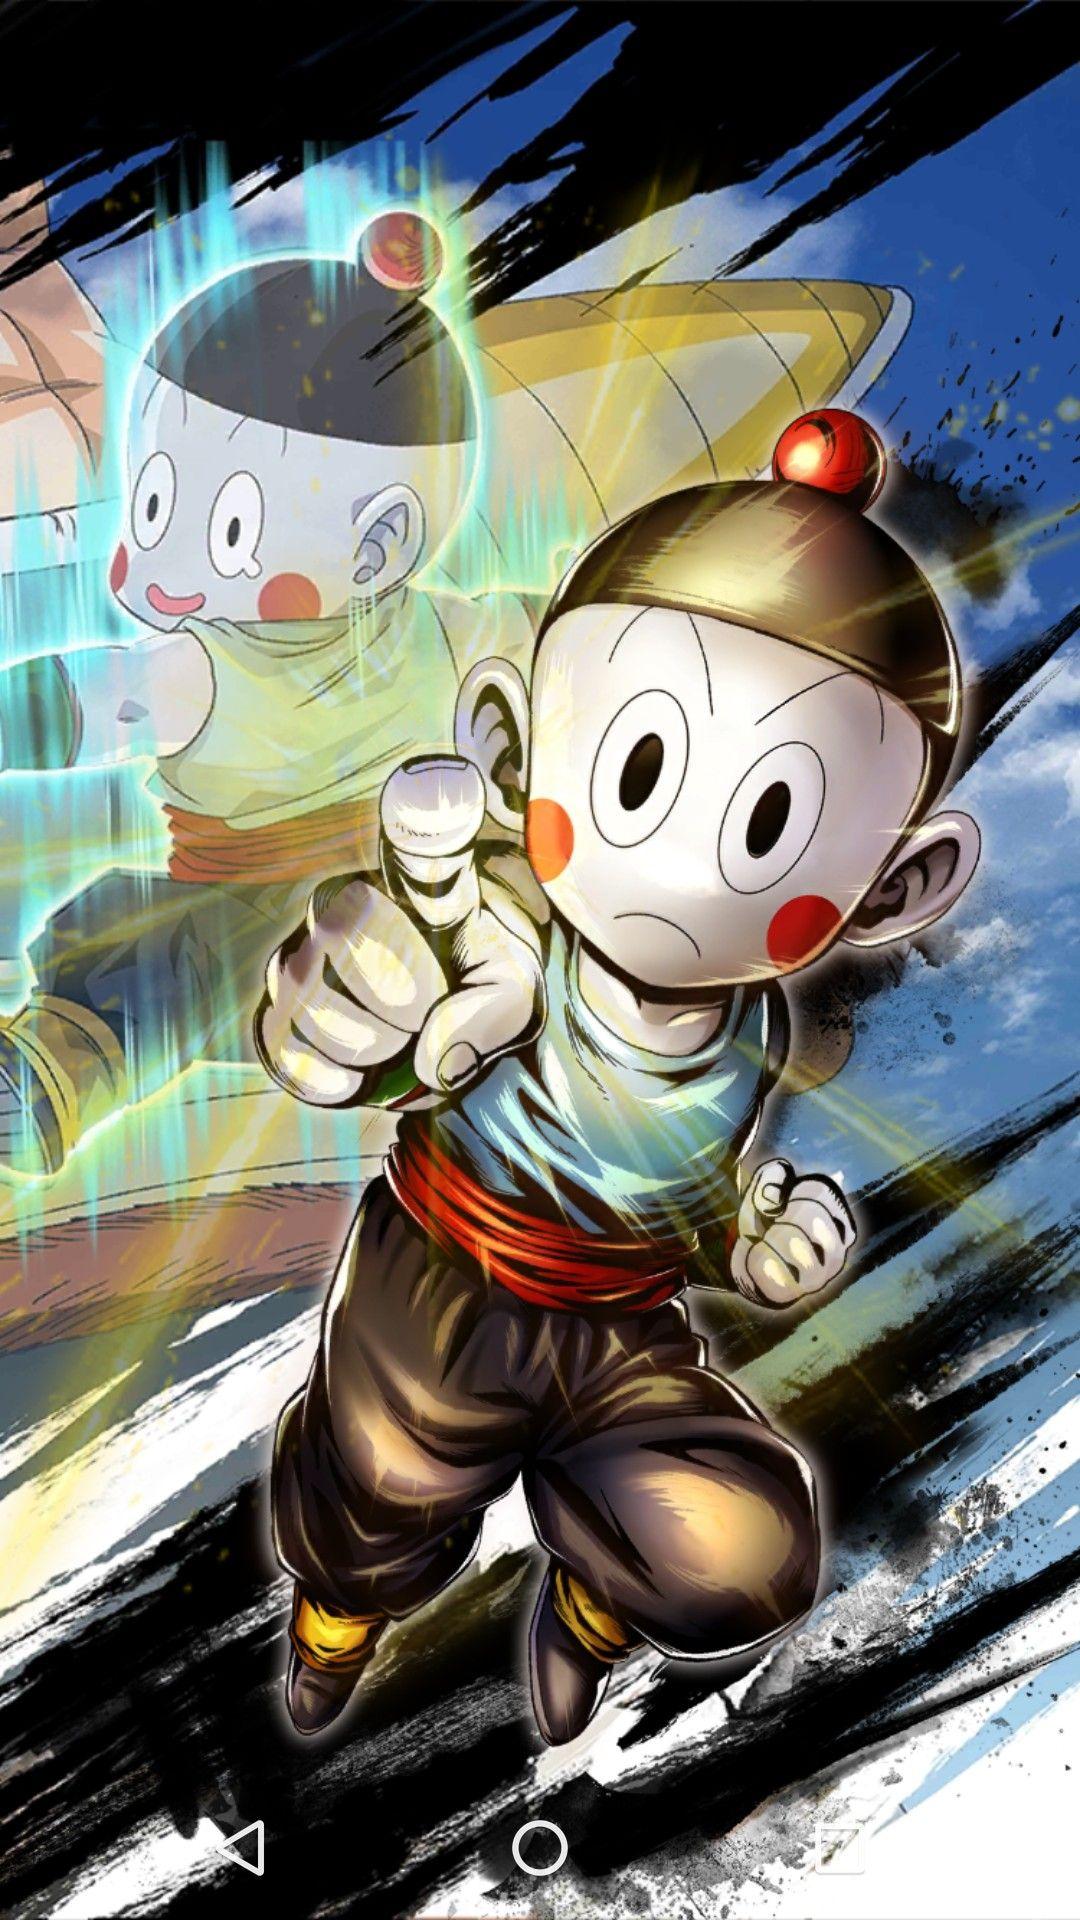 Pin By Prince Dan On Dragon Ball Legends Anime Dragon Ball Dragon Ball Art Dragon Ball Z